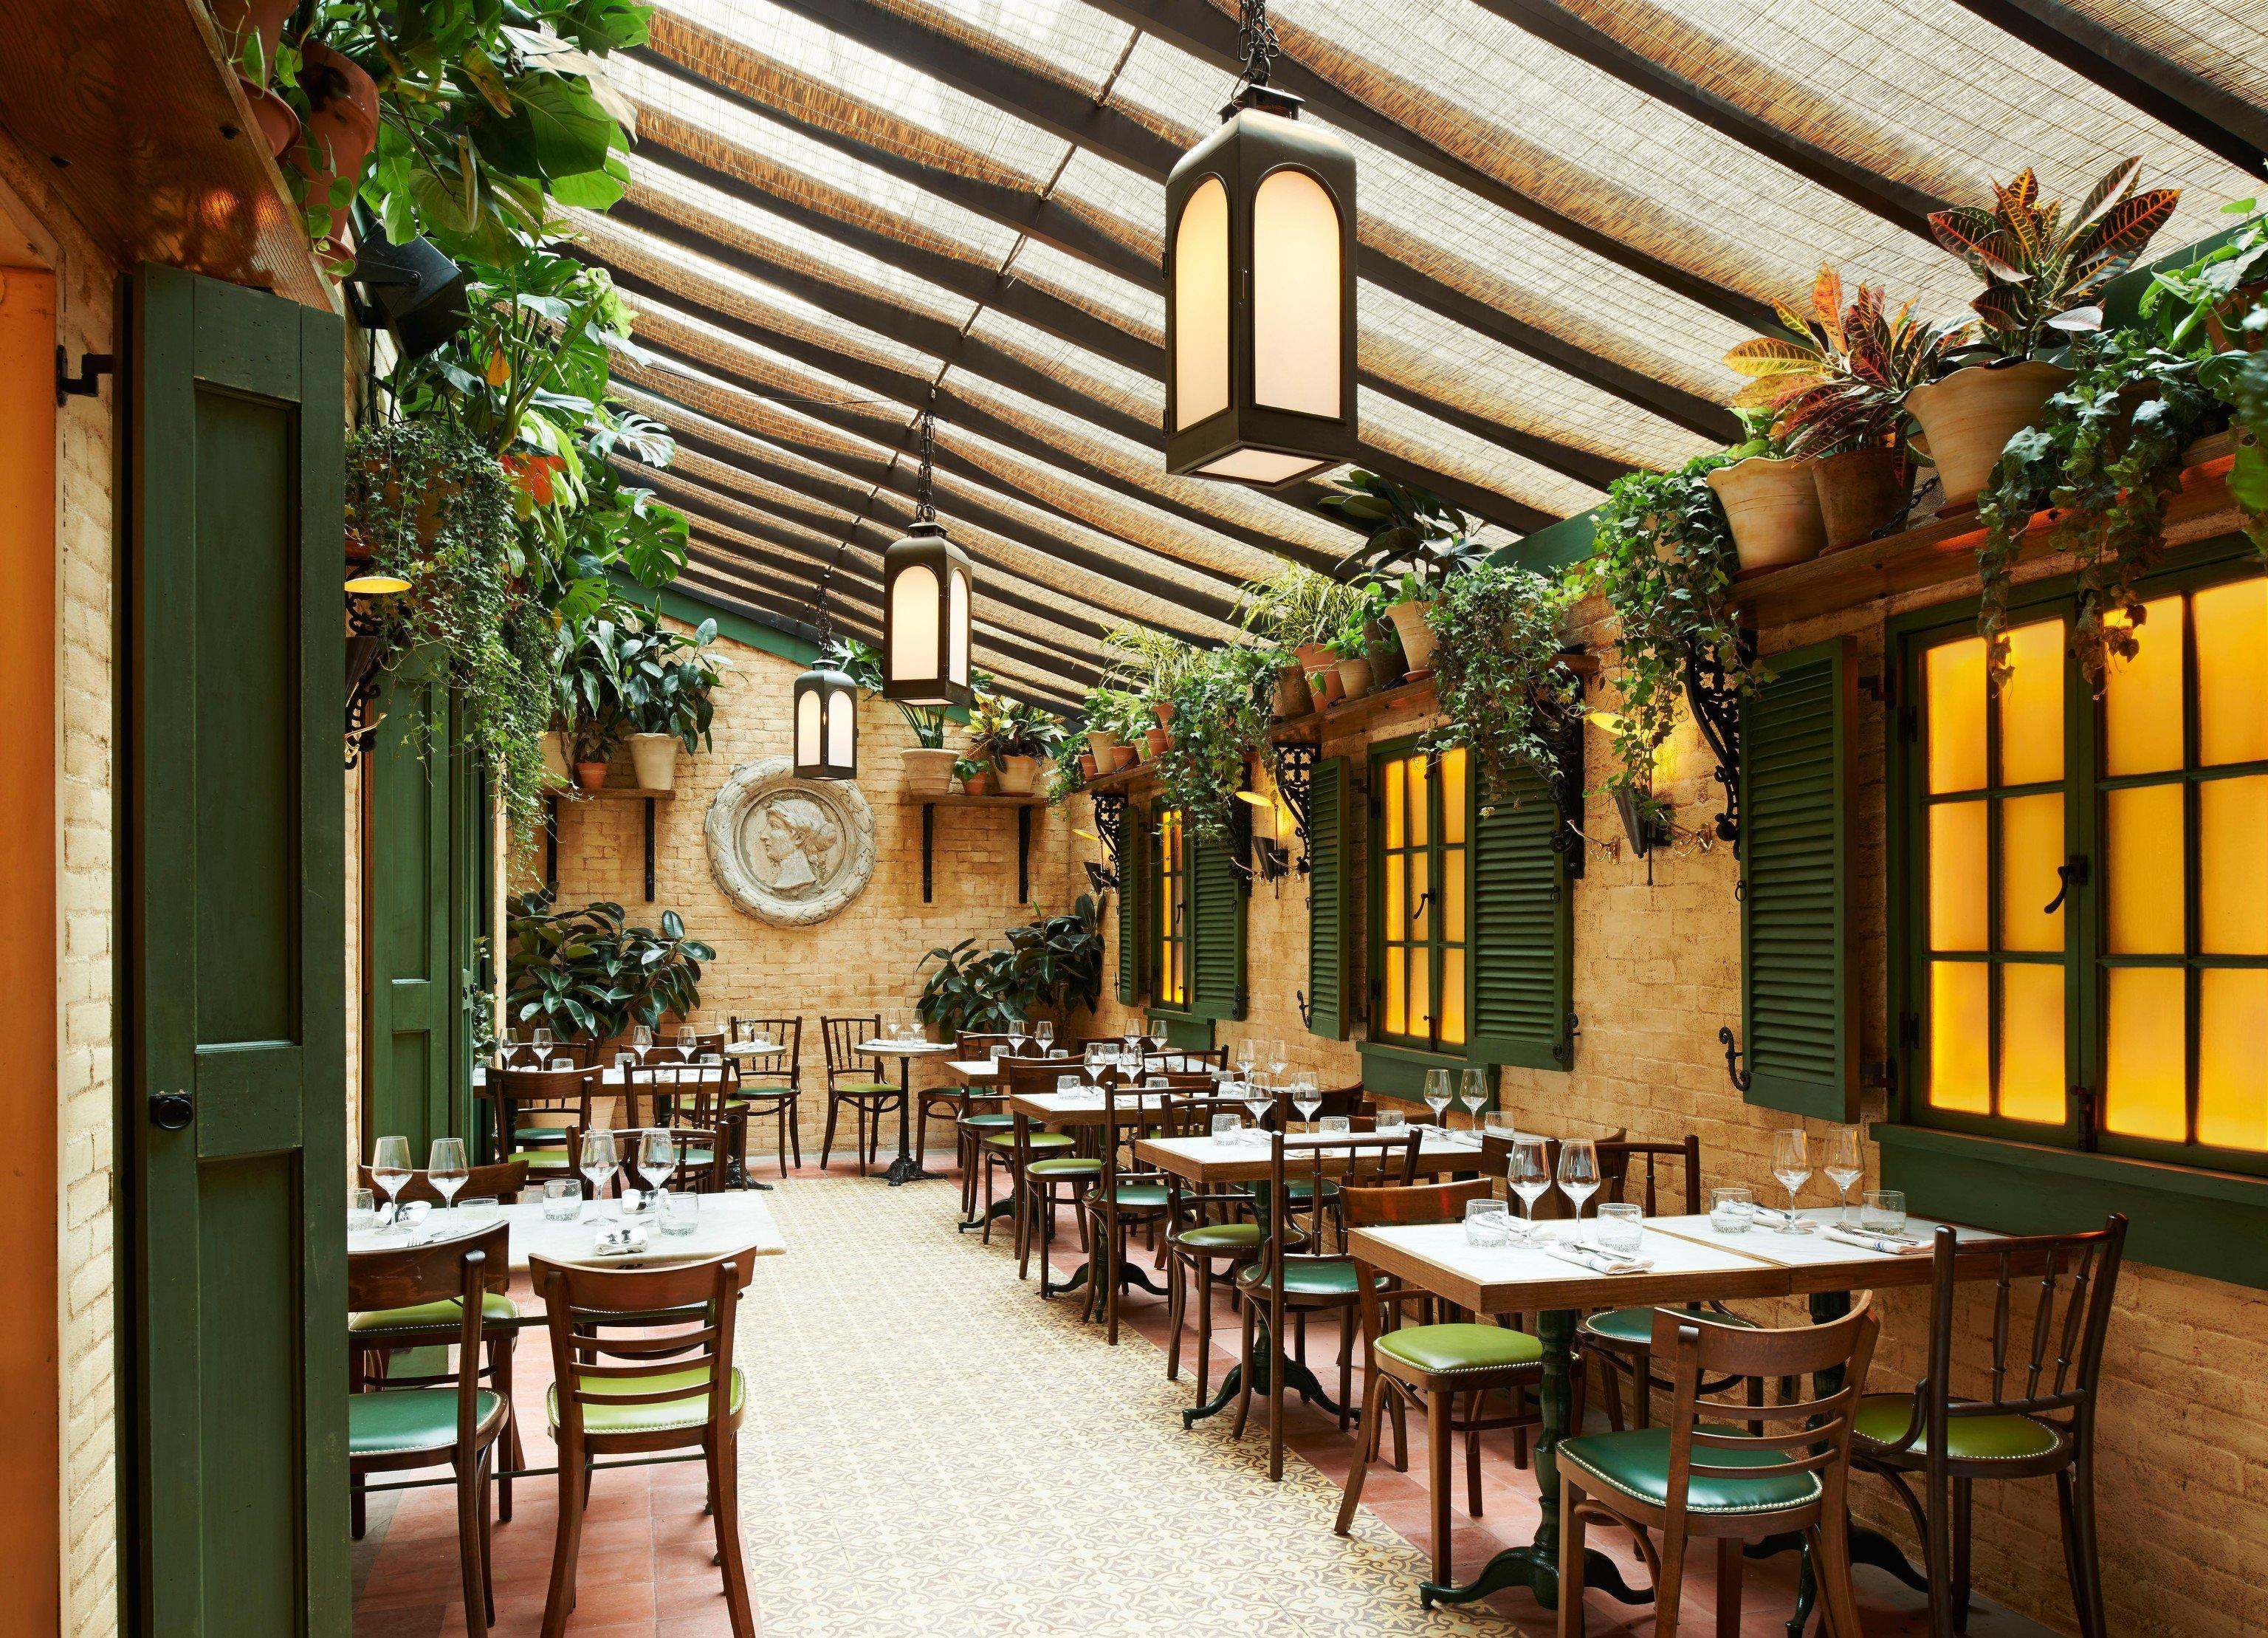 Trip Ideas outdoor chair room restaurant estate Resort home interior design furniture several dining room